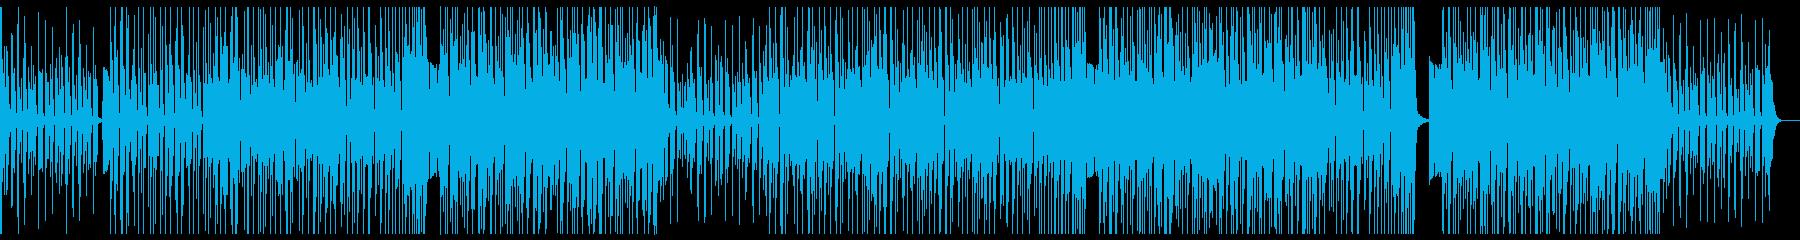 K-POP、洋楽、ヒップホップ aの再生済みの波形